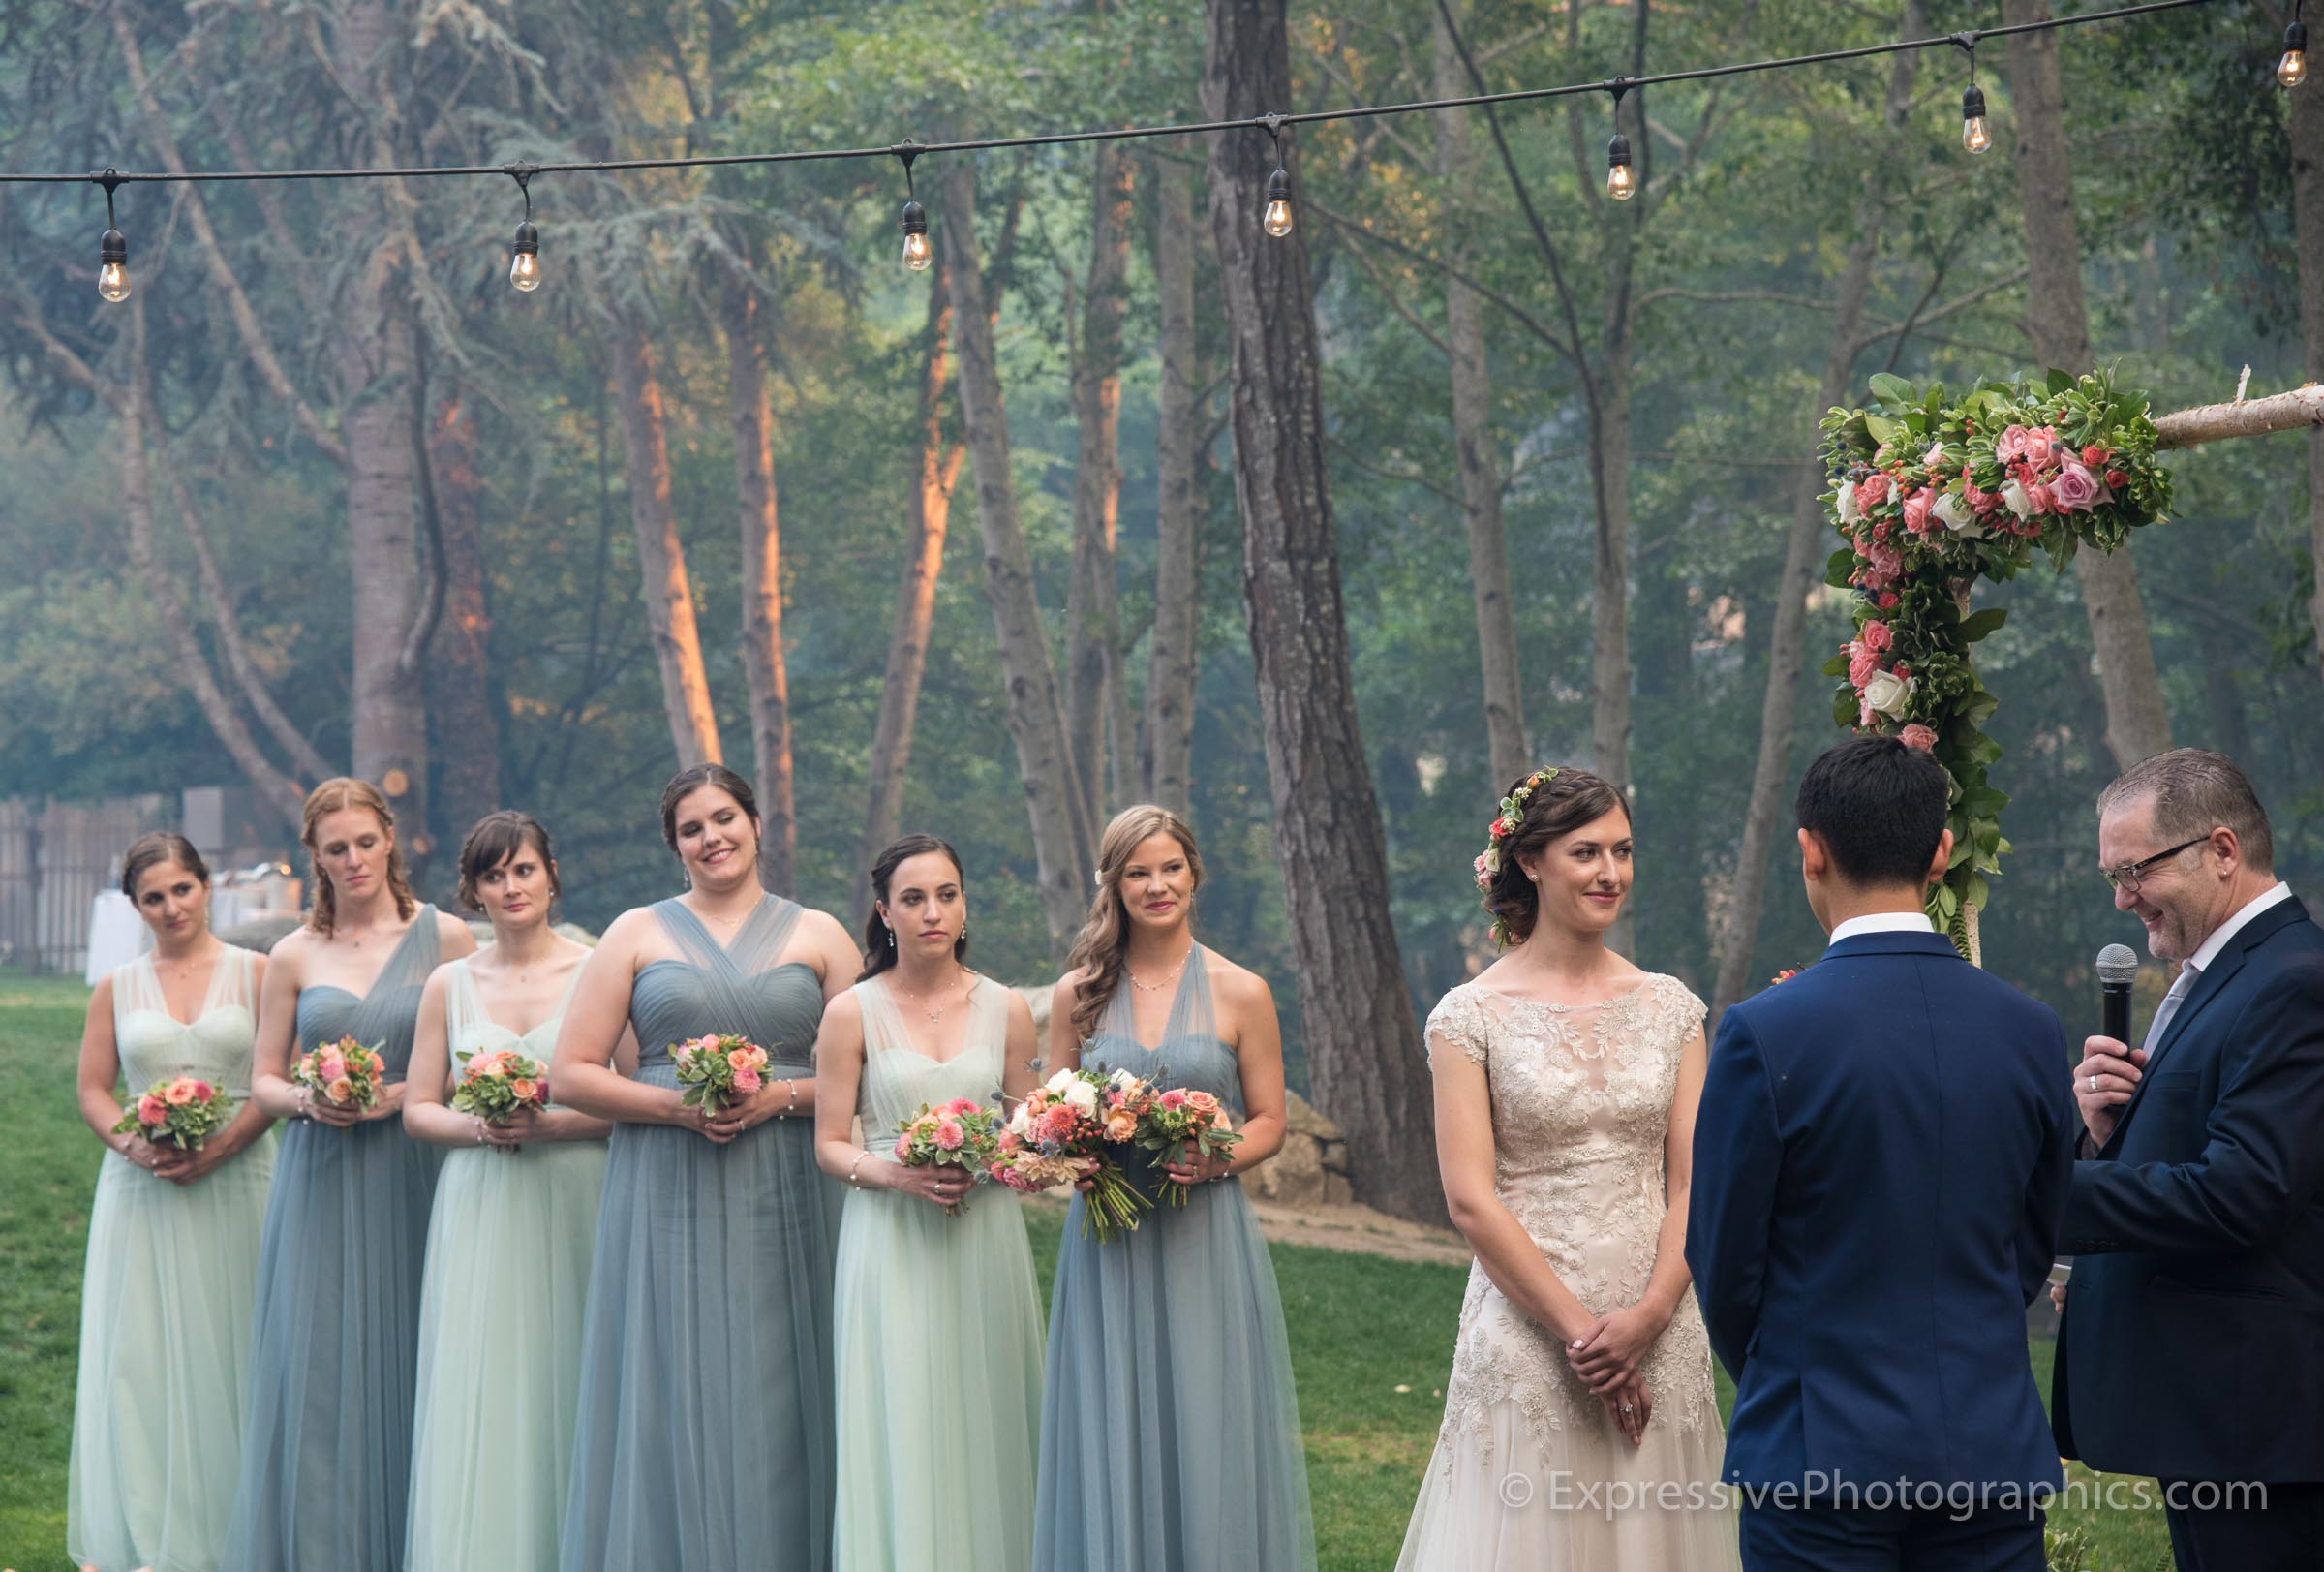 Expressive-Photographics-altar-bride-20160723_0647.jpg